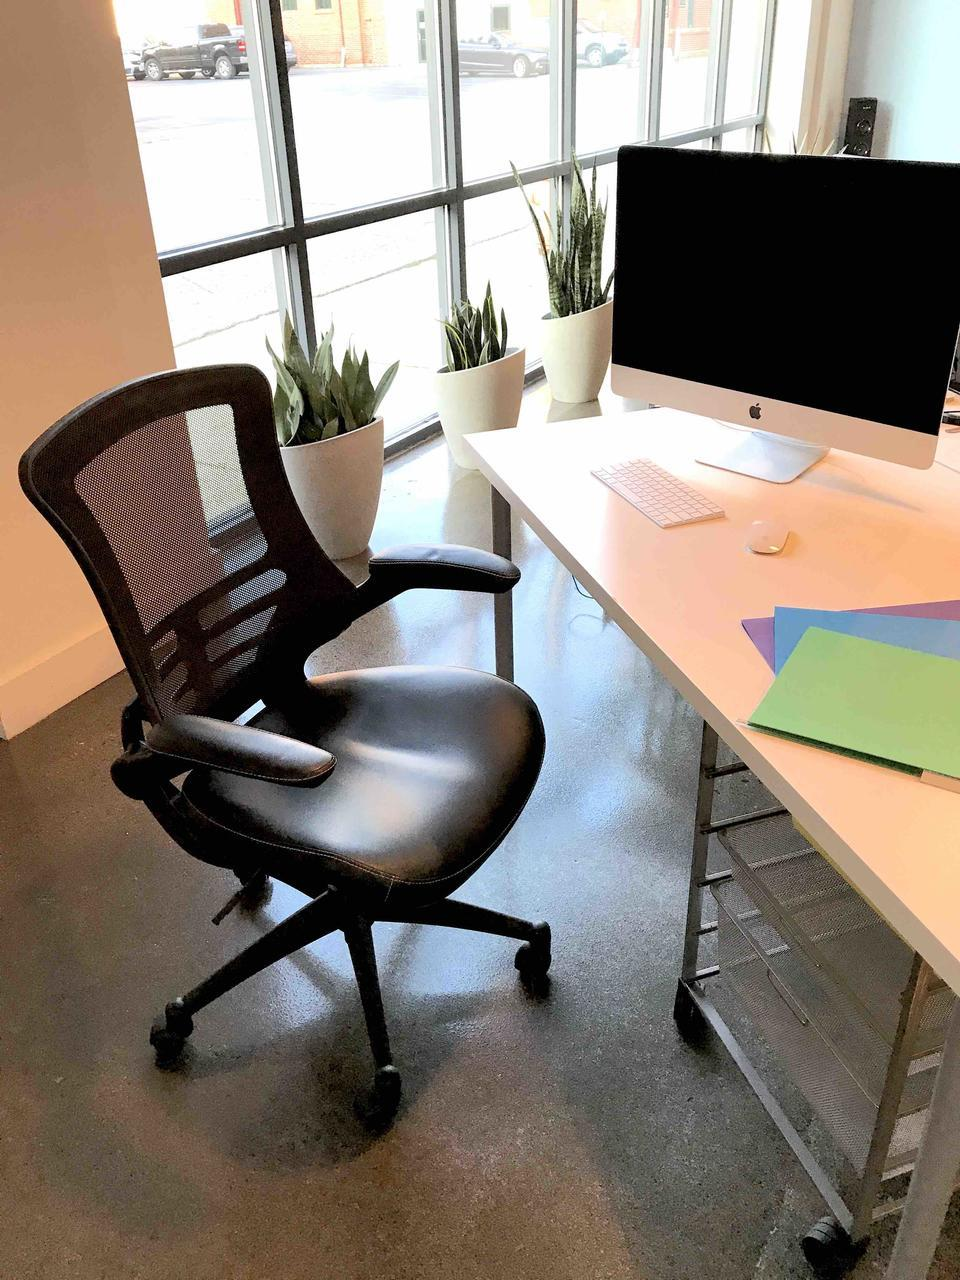 Martini Media Group - Dedicated Desk in Open, Creative Space